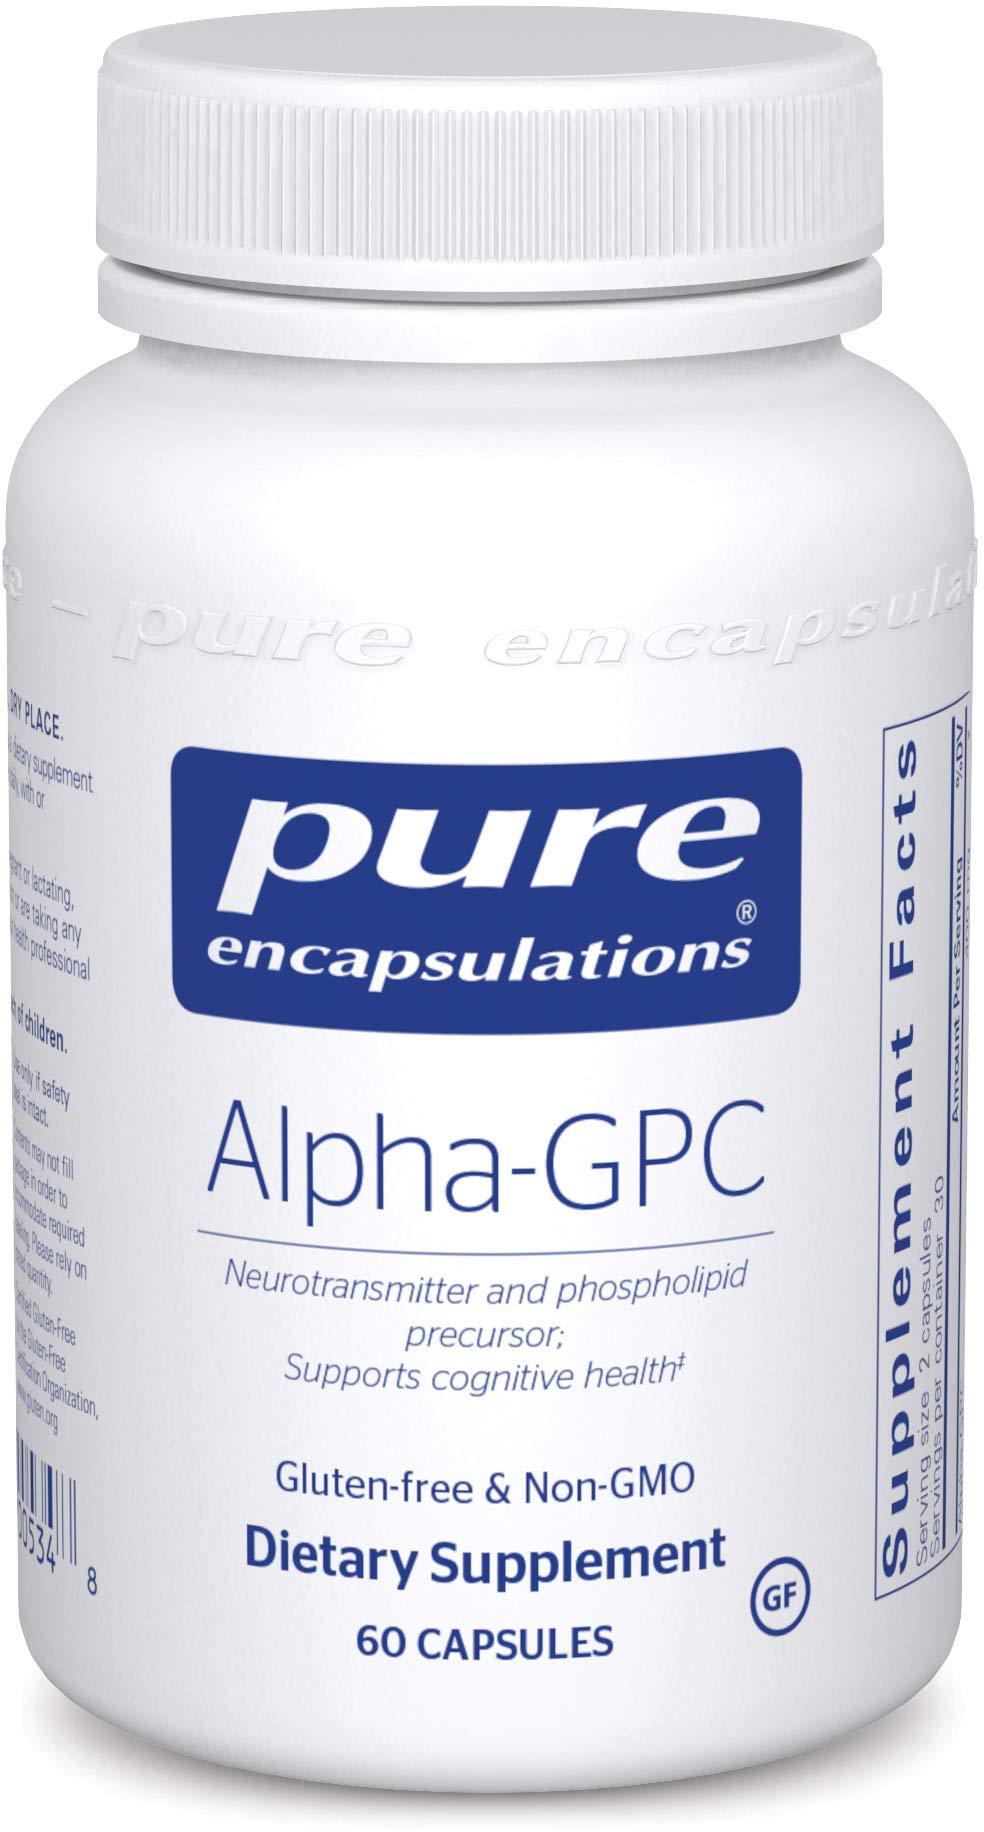 Pure Encapsulations - Alpha-GPC - Neurotransmitter and Phospholipid Precursor to Support Cognitive Health* - 60 Capsules